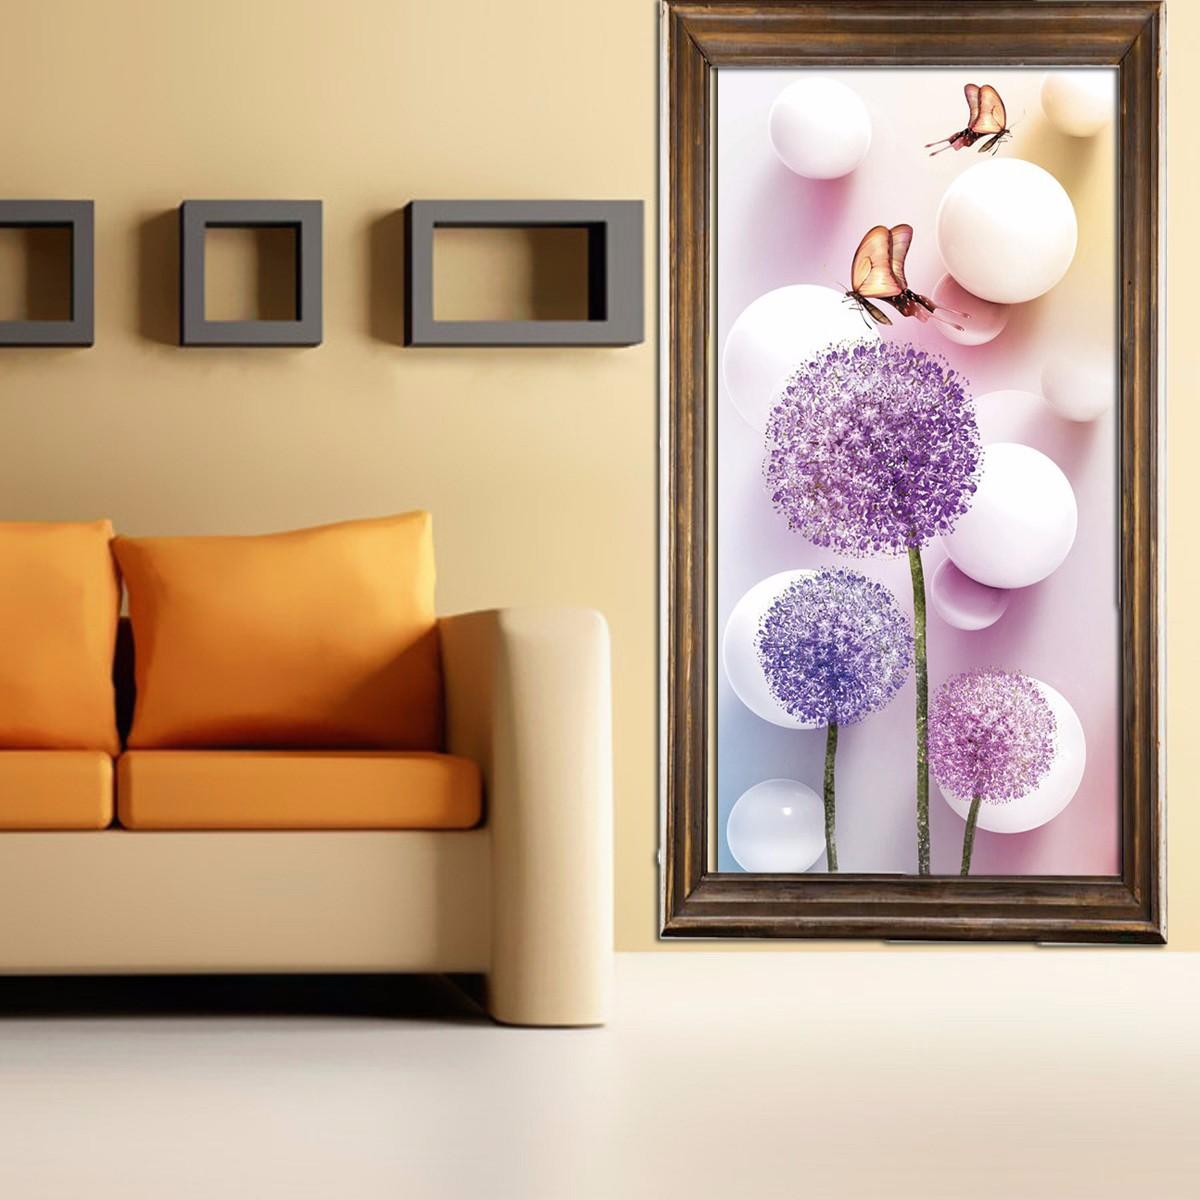 Diy 5d dandelion diamond sticker cross stitch painting for Home decor 5d